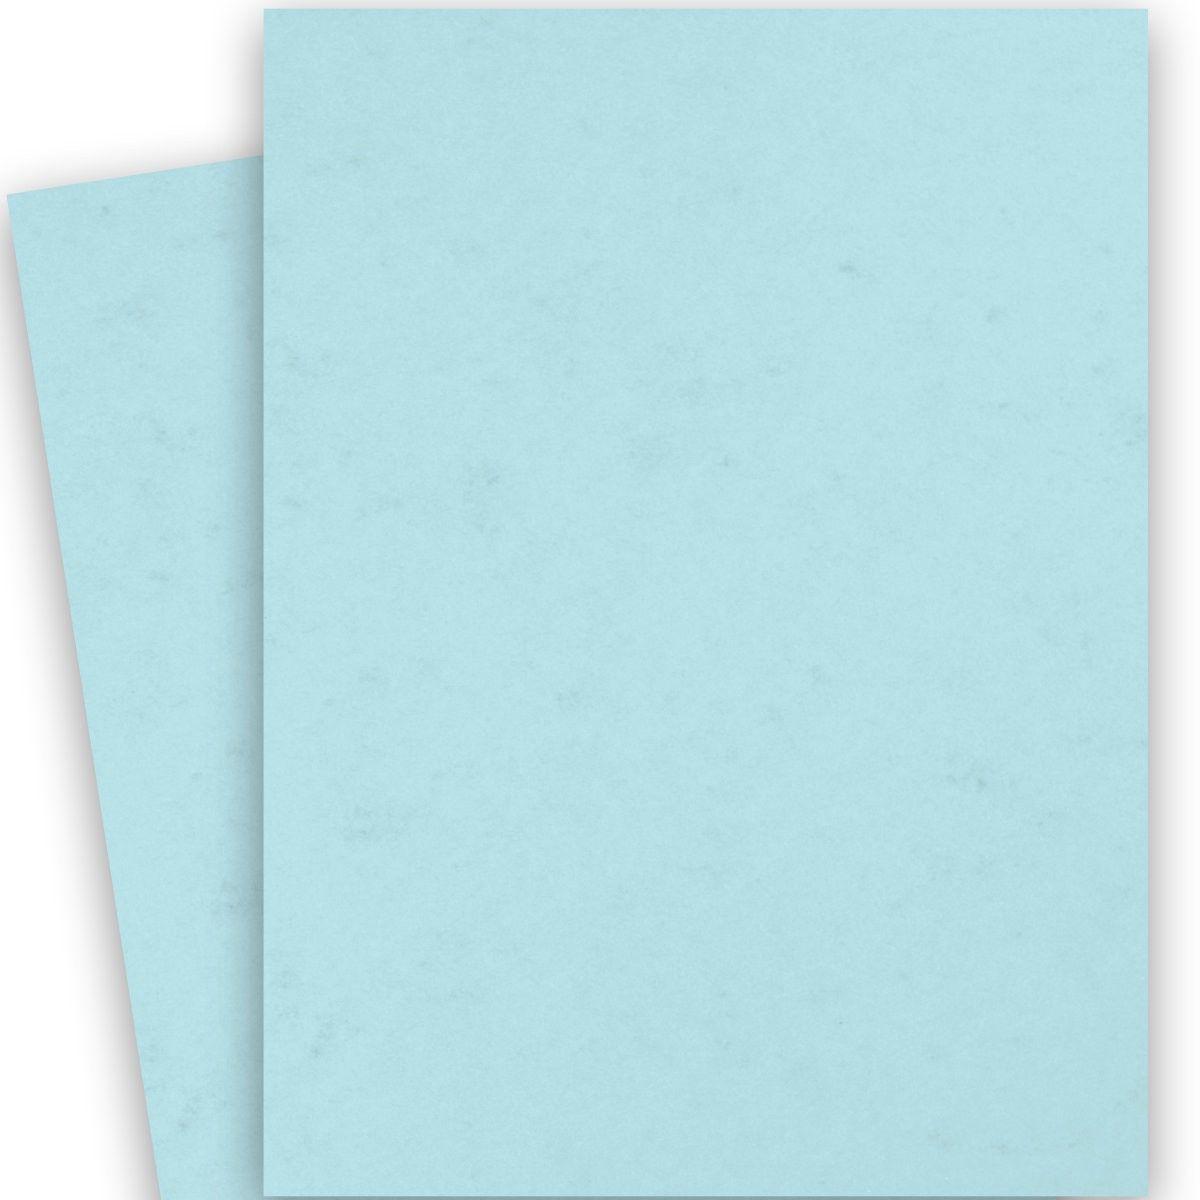 Durotone Butcher 26x40 Card Stock Paper Extra Blue 80lb